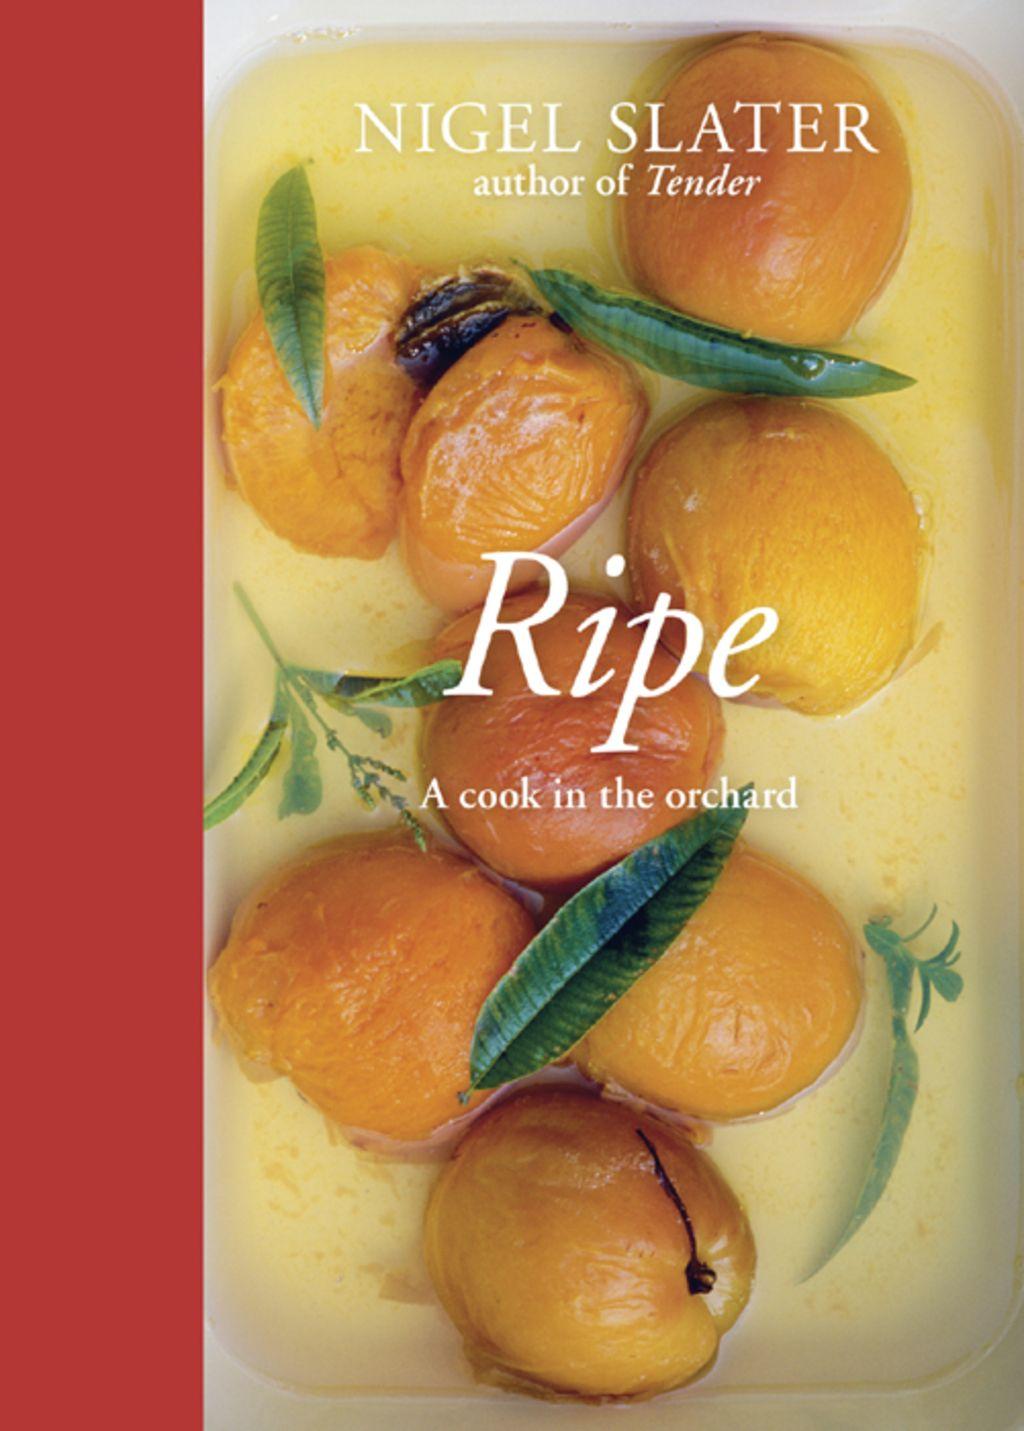 Ripe (eBook) | Nigel slater, New cookbooks, Cooking